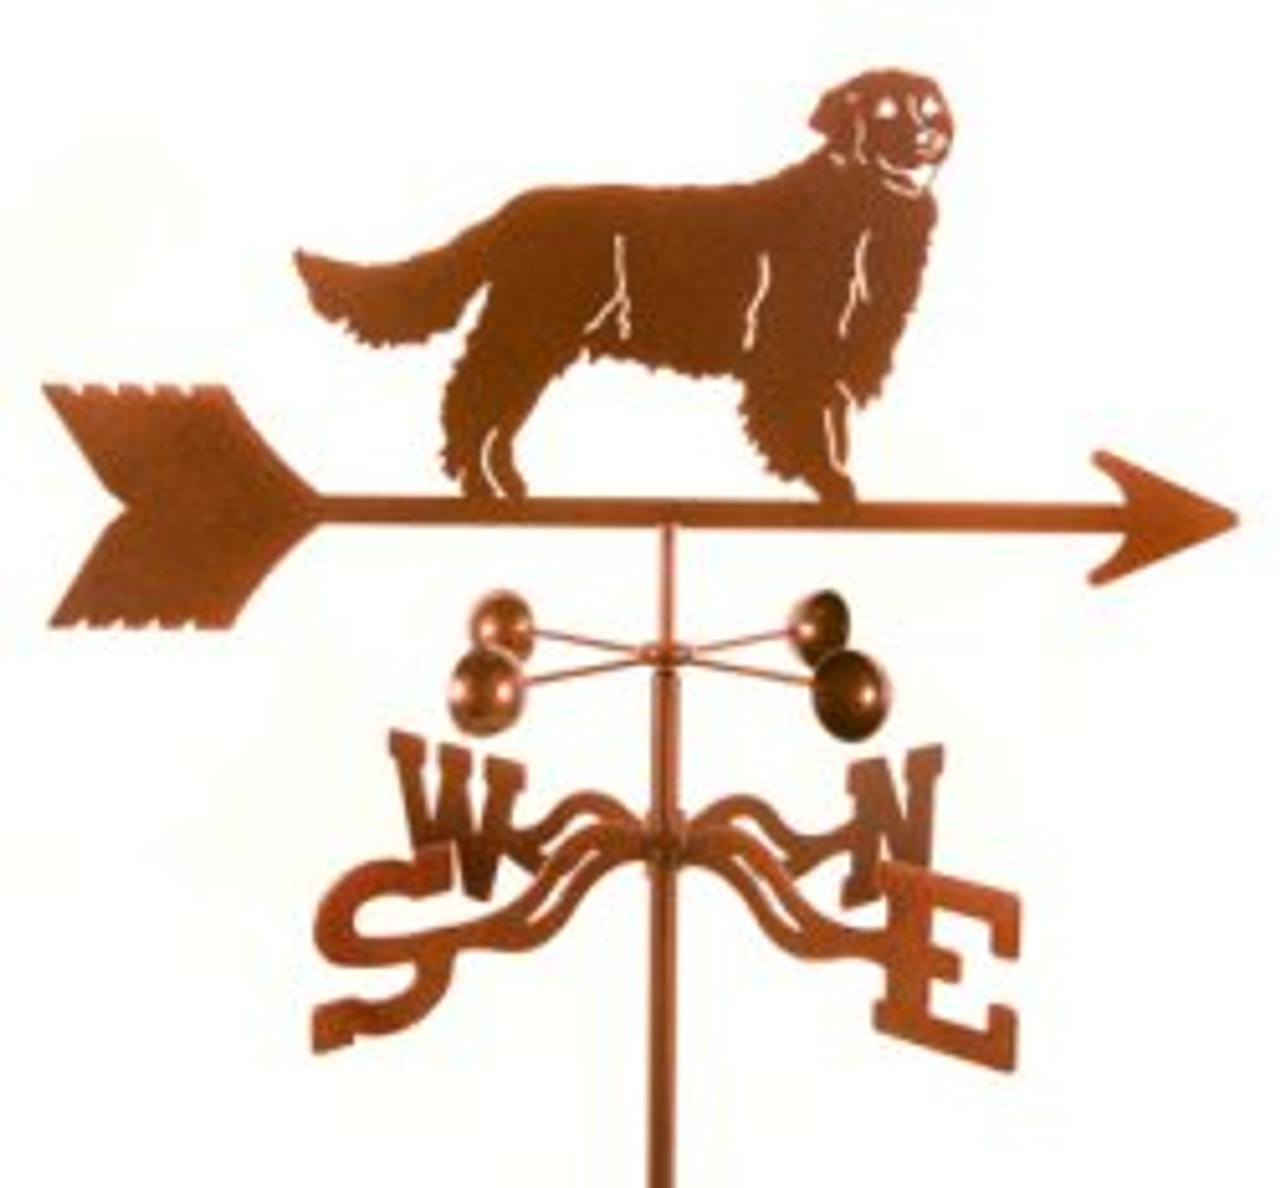 Dog-Golden Retreiver Weathervane with mount